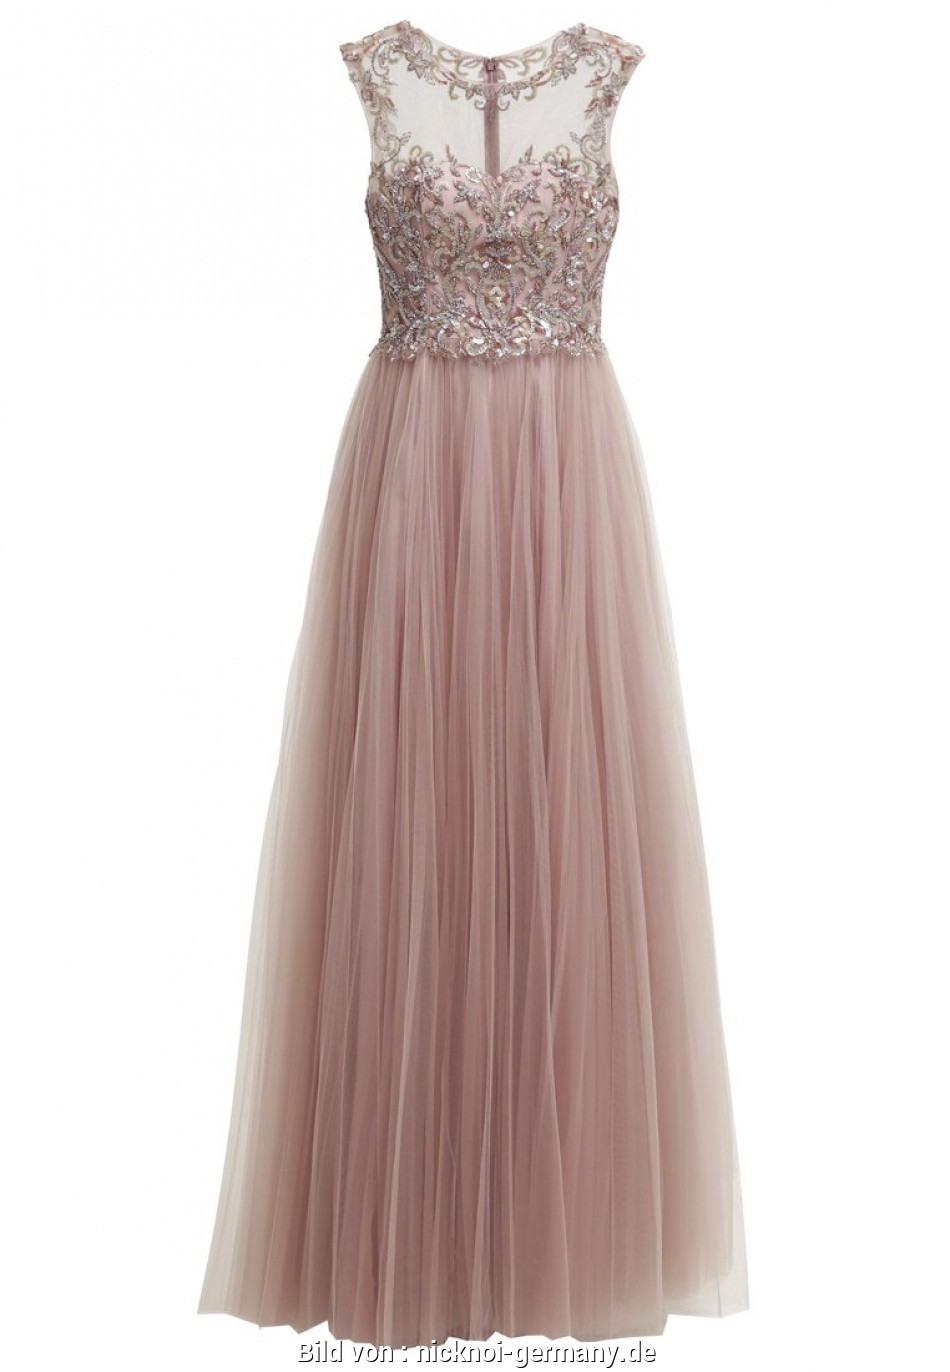 Abend Cool Zalando Abendkleid Lang VertriebDesigner Erstaunlich Zalando Abendkleid Lang Stylish